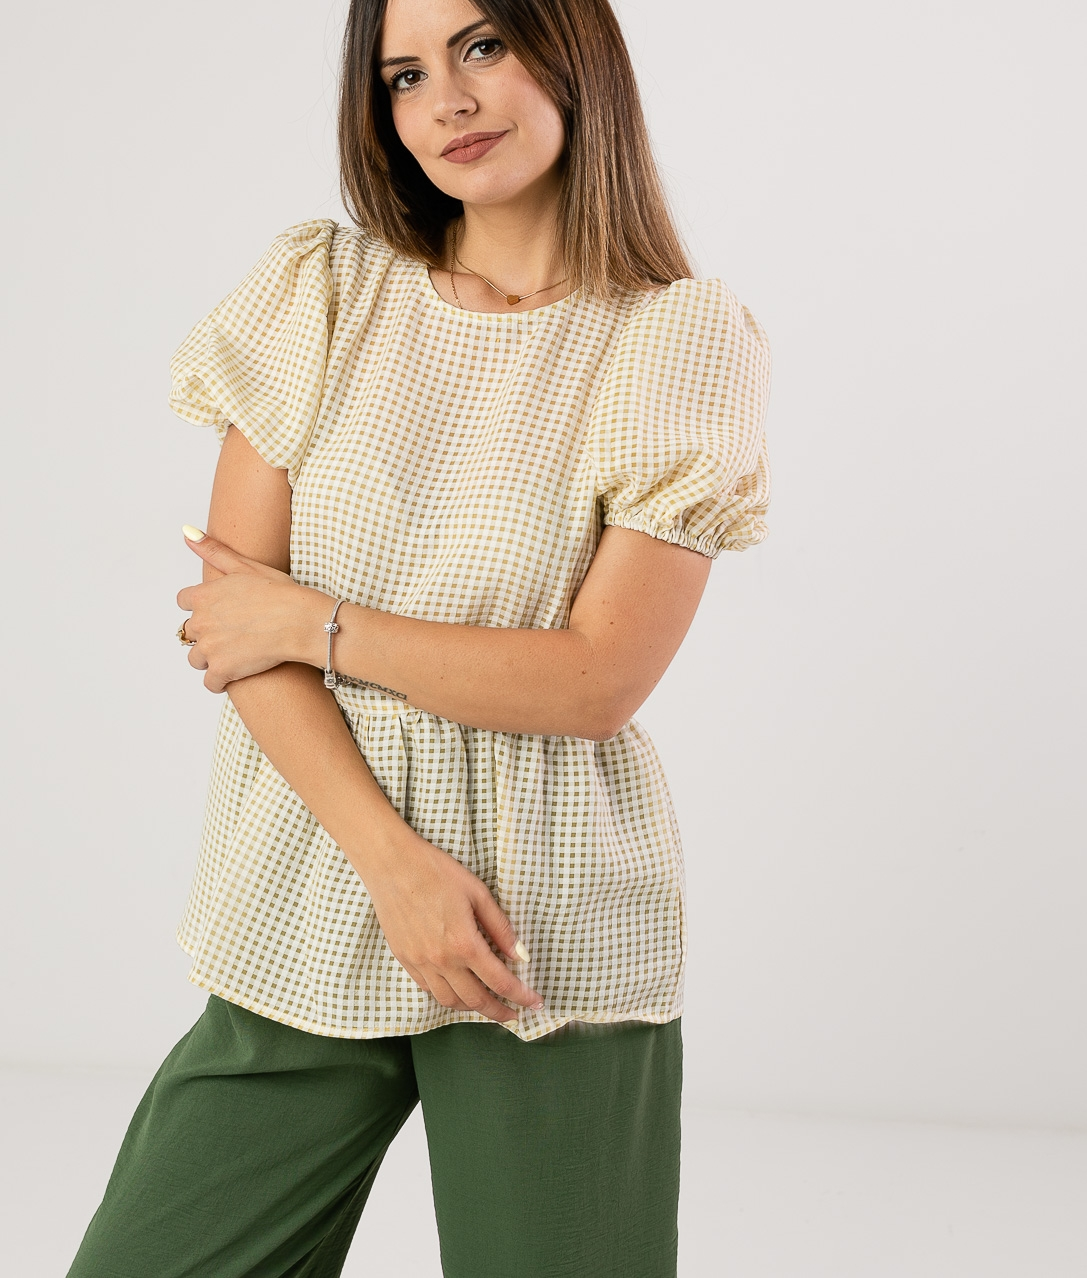 Camiseta Tajama - Lima